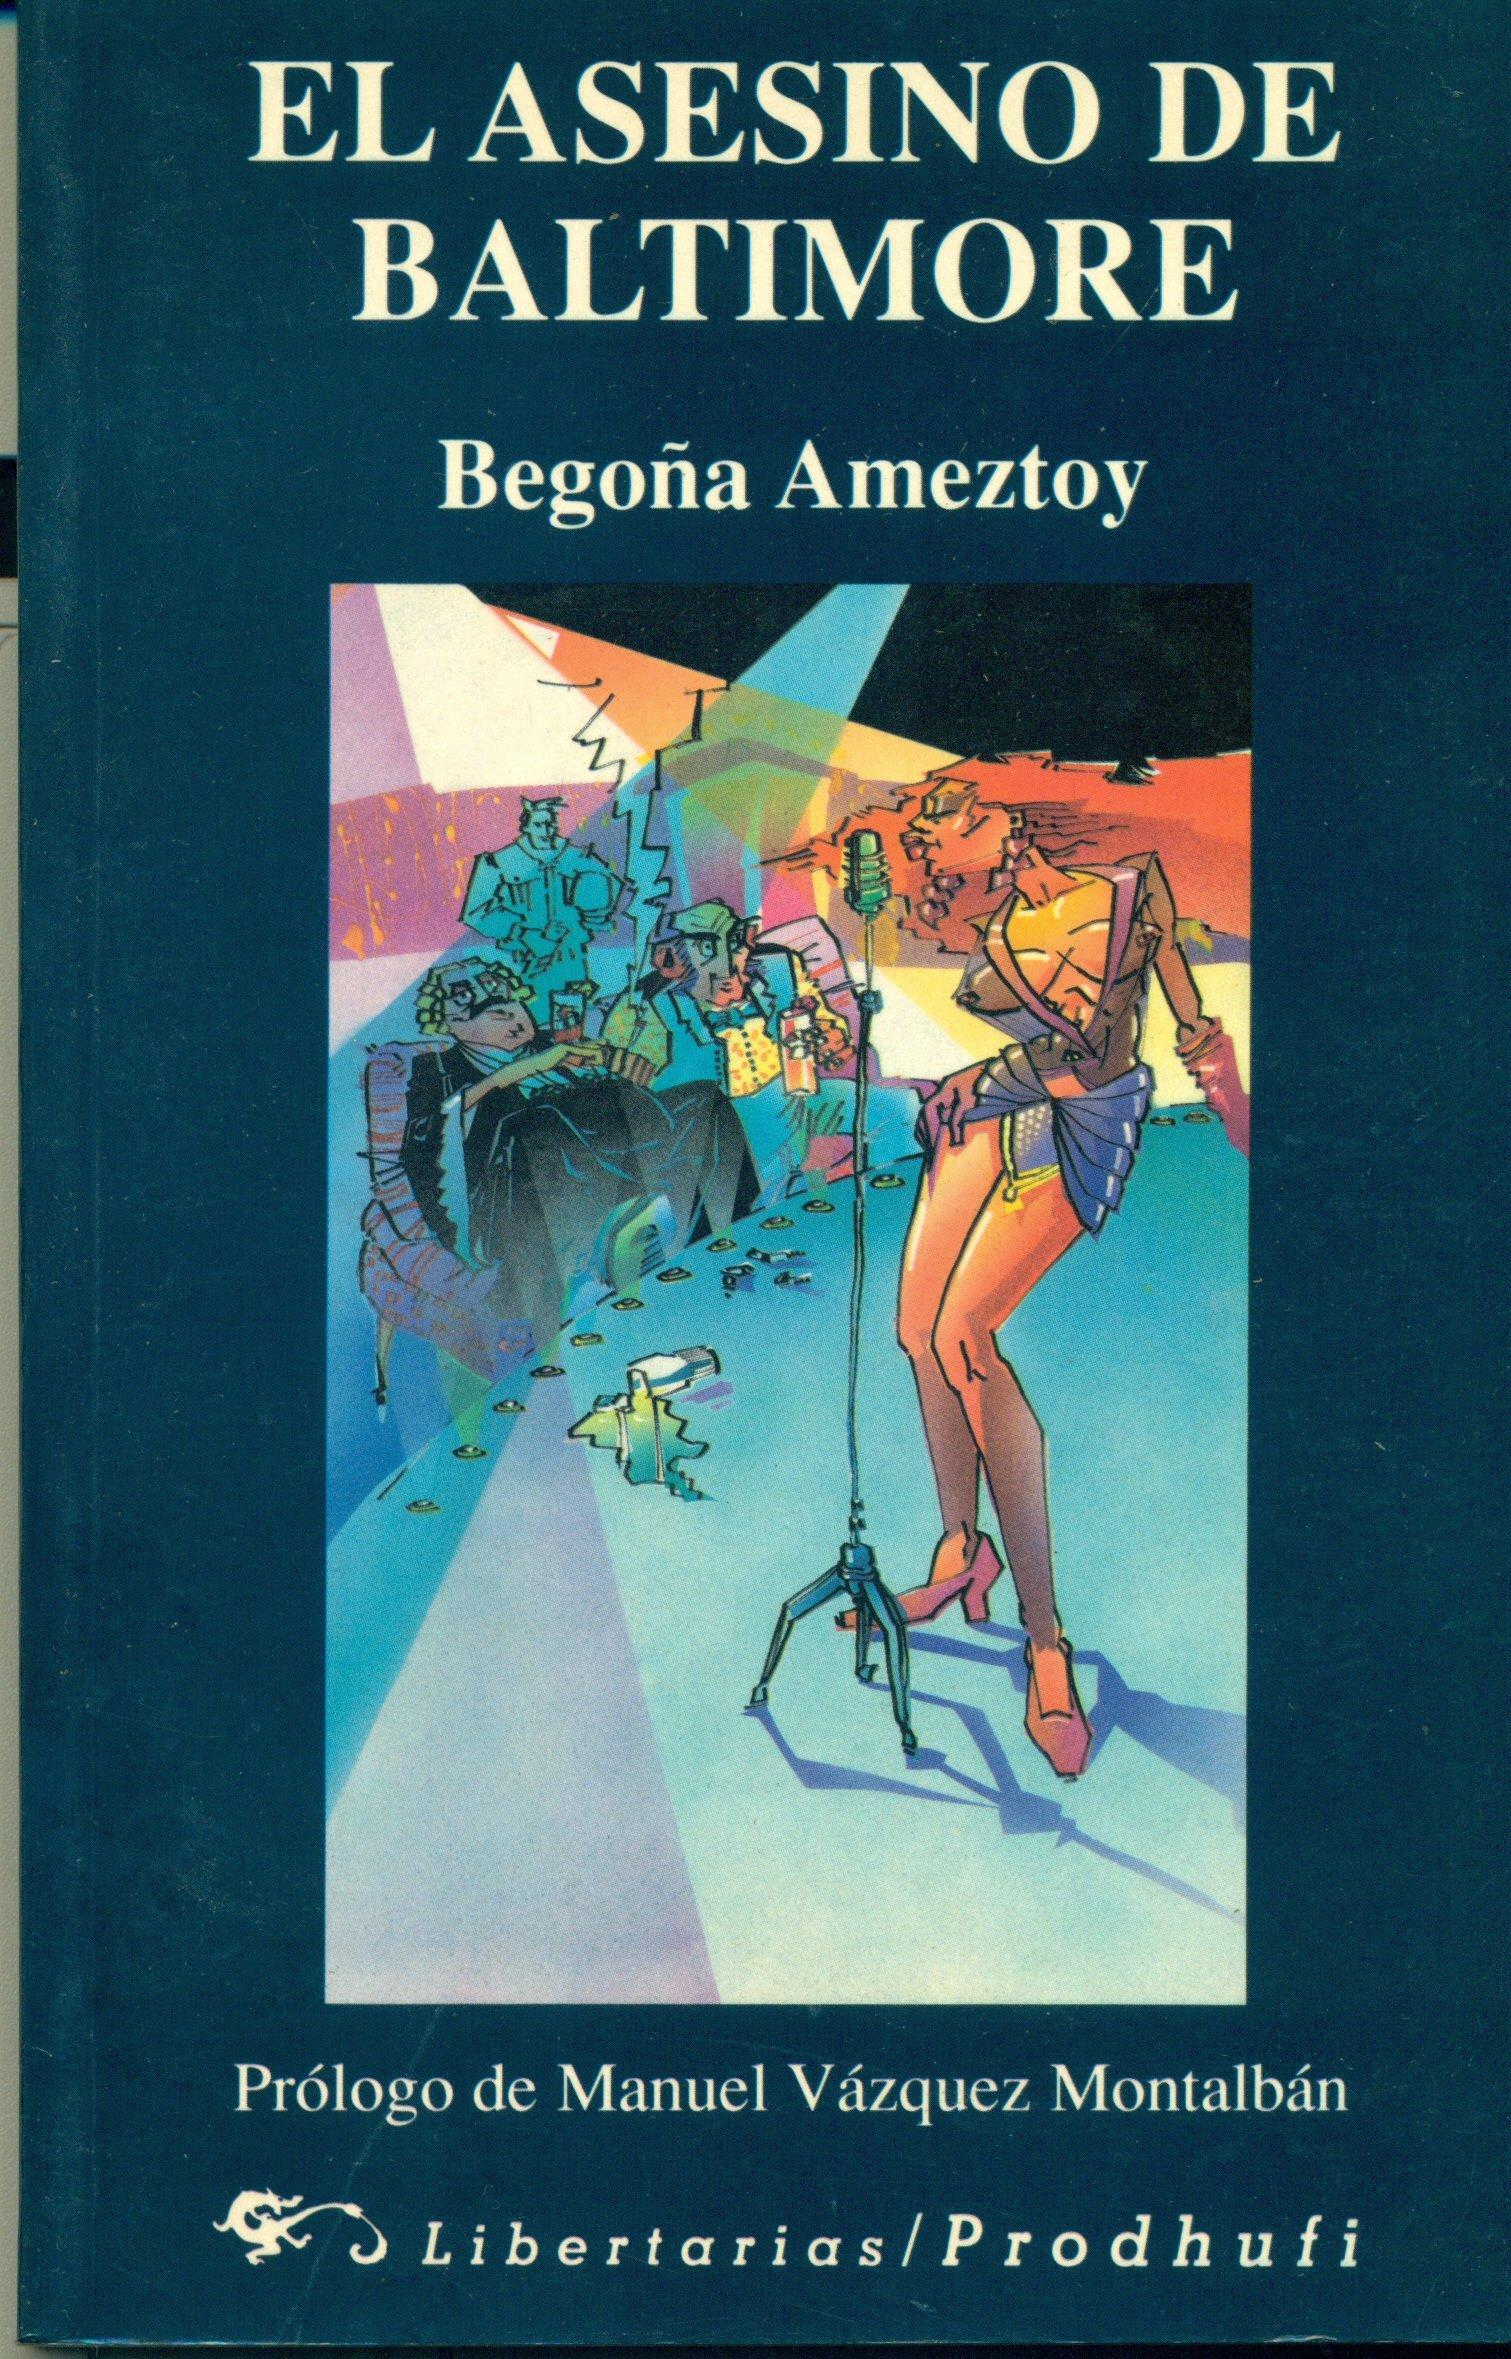 Asesino de baltimore,el: Amazon.es: Begoña Ameztoy: Libros